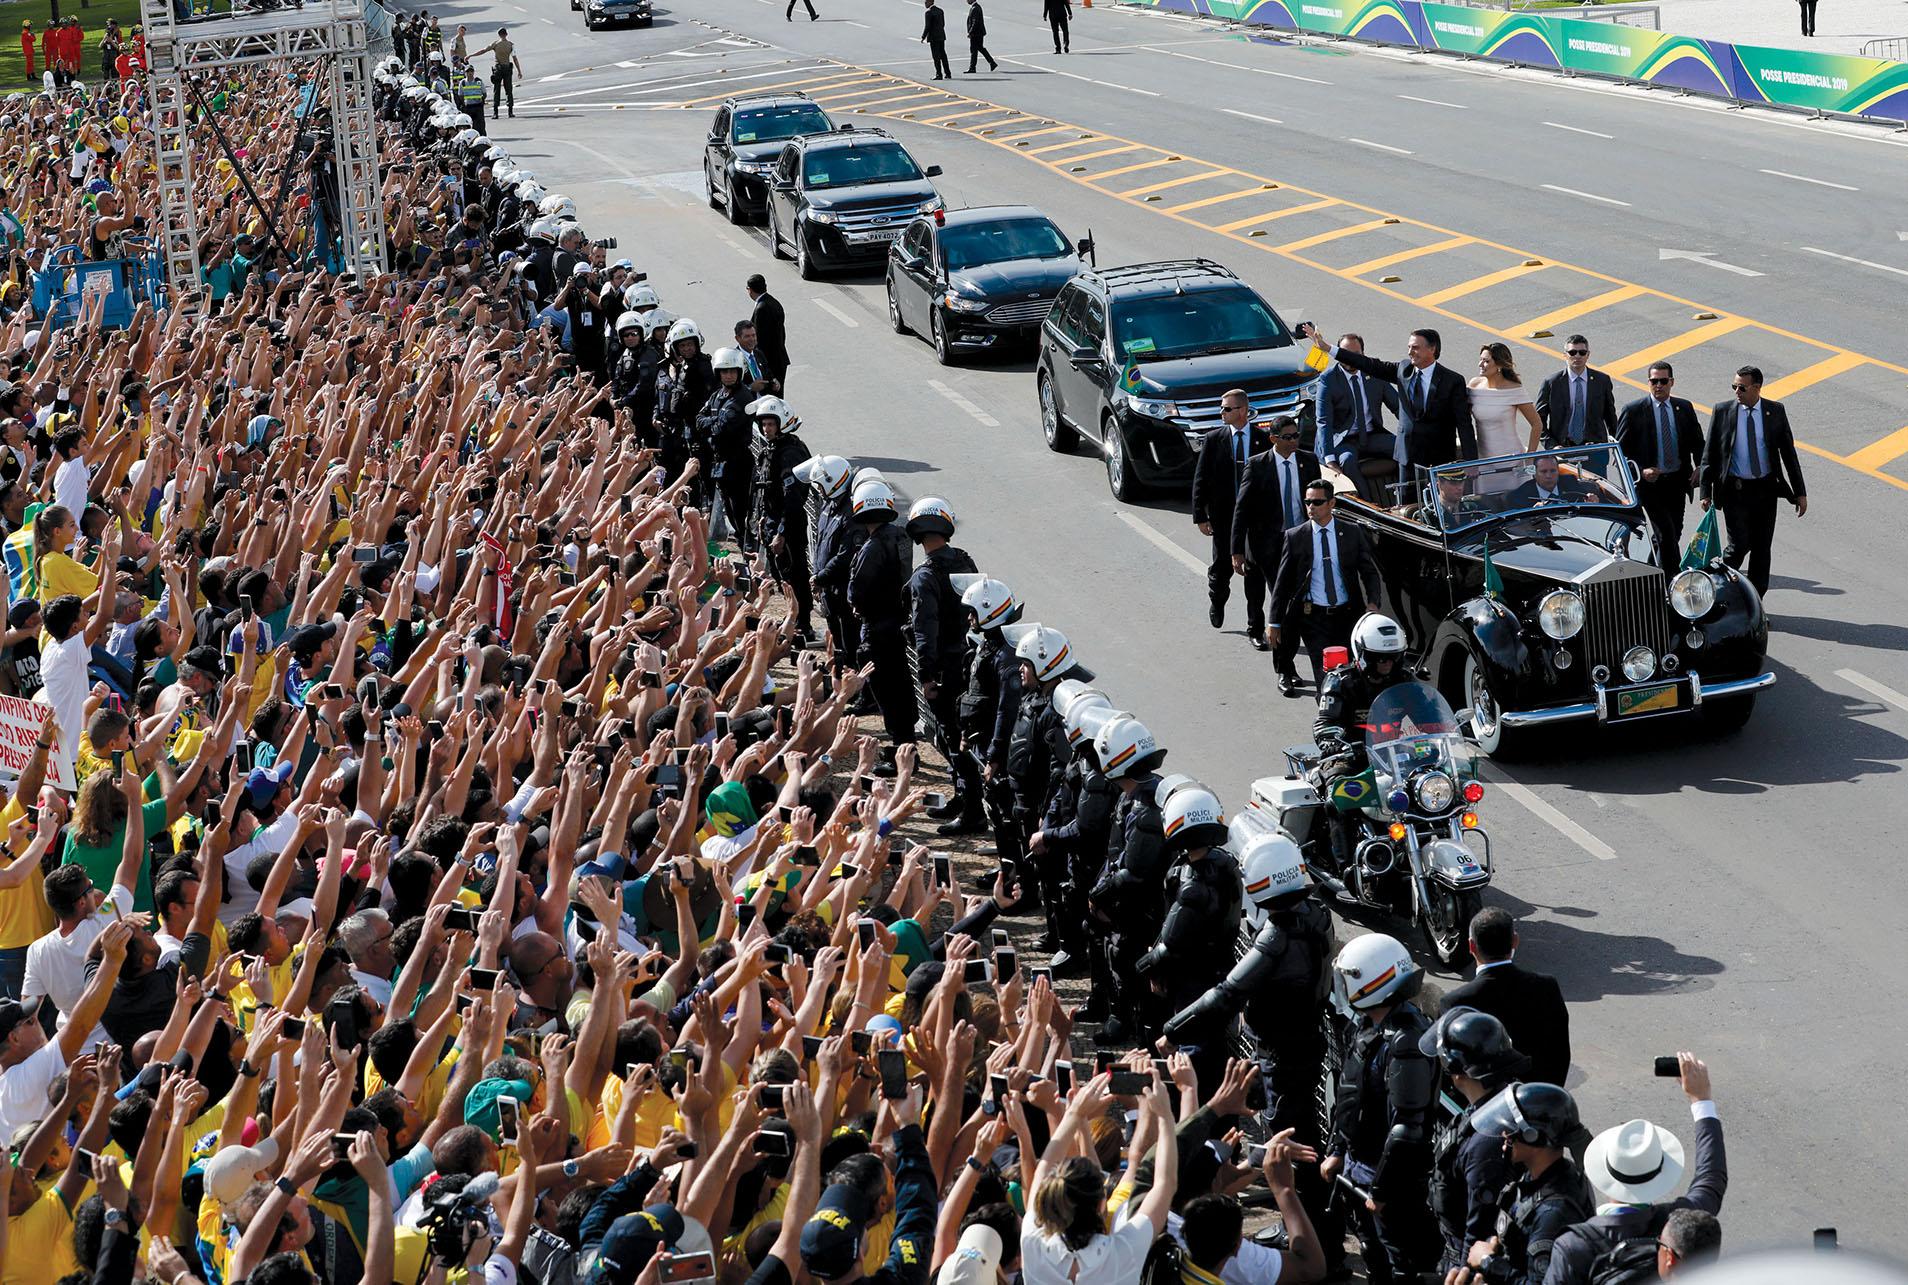 Brazilian President Jair Bolsonaro waves to supporters following his swearing-in ceremony, January 2019. (Photo by Silvia Izquierdo/AP Photo.)